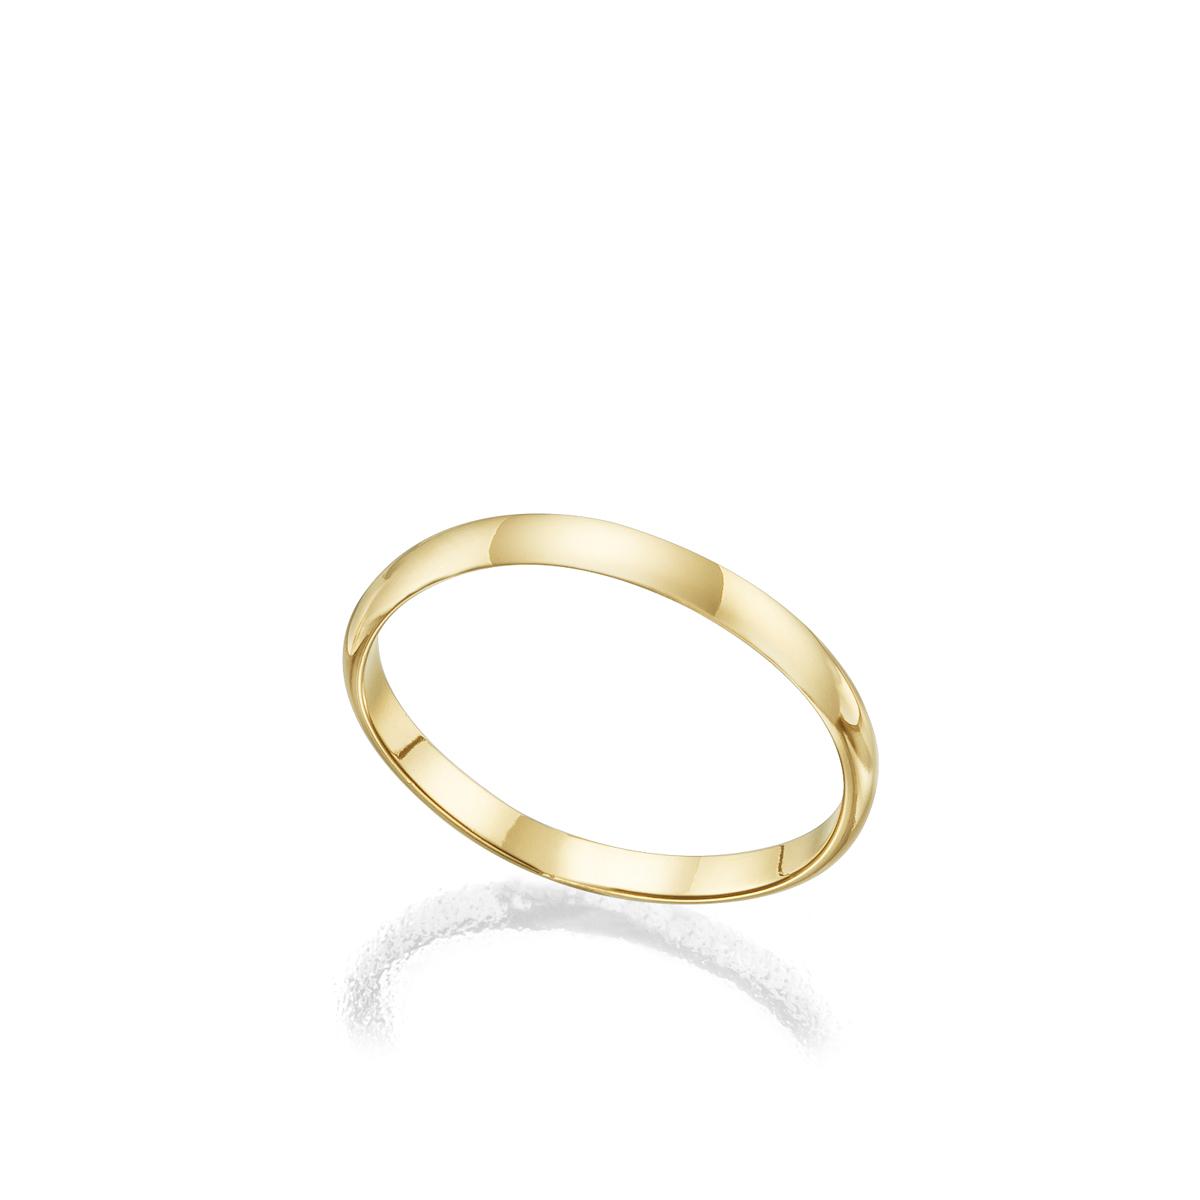 2 mm wide semicircular profile gold ring